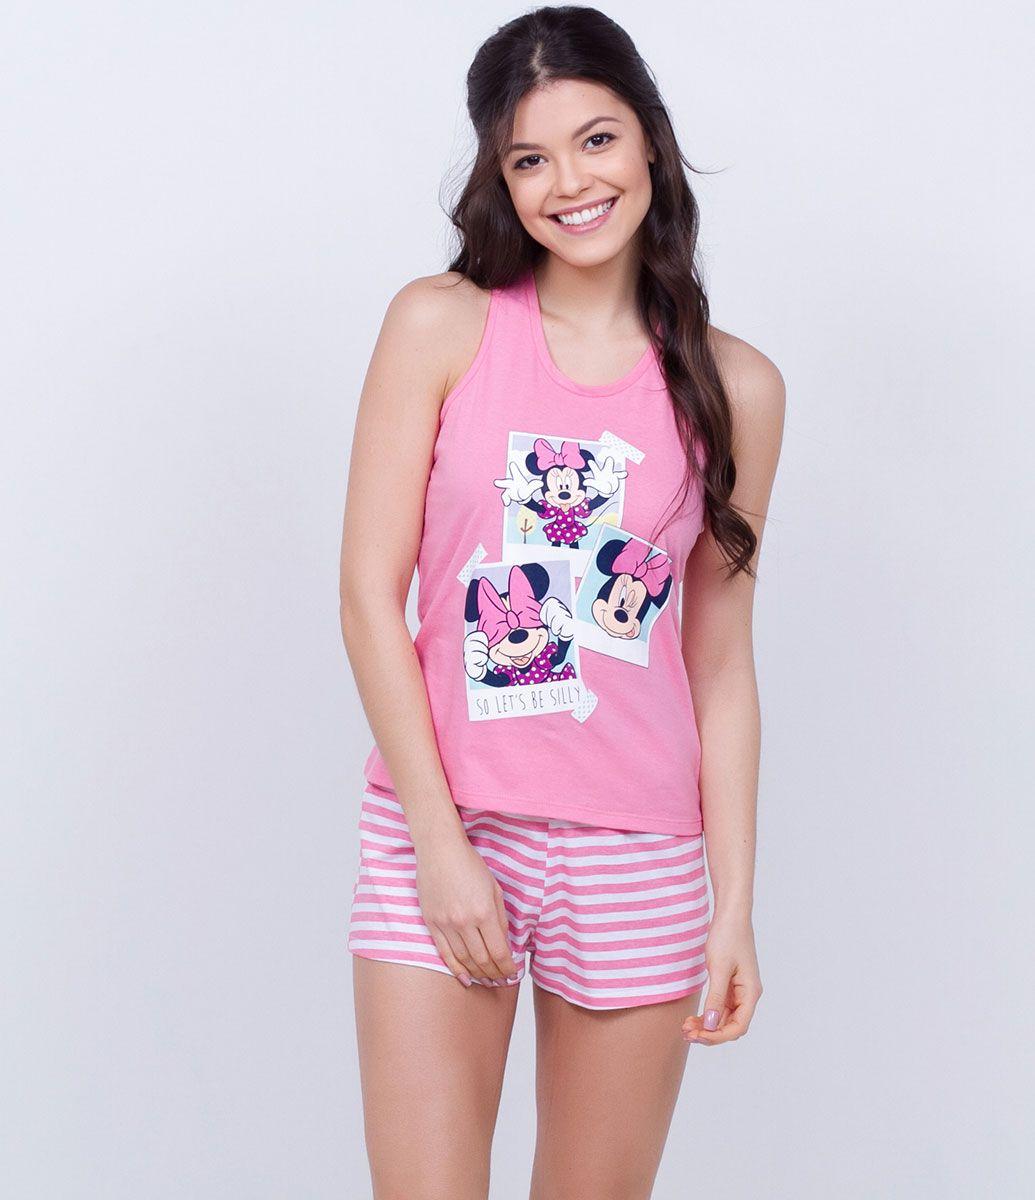 ca247fccf4e95b Pijama Short Doll com Estampa Minnie - Lojas Renner | Pajamas in ...